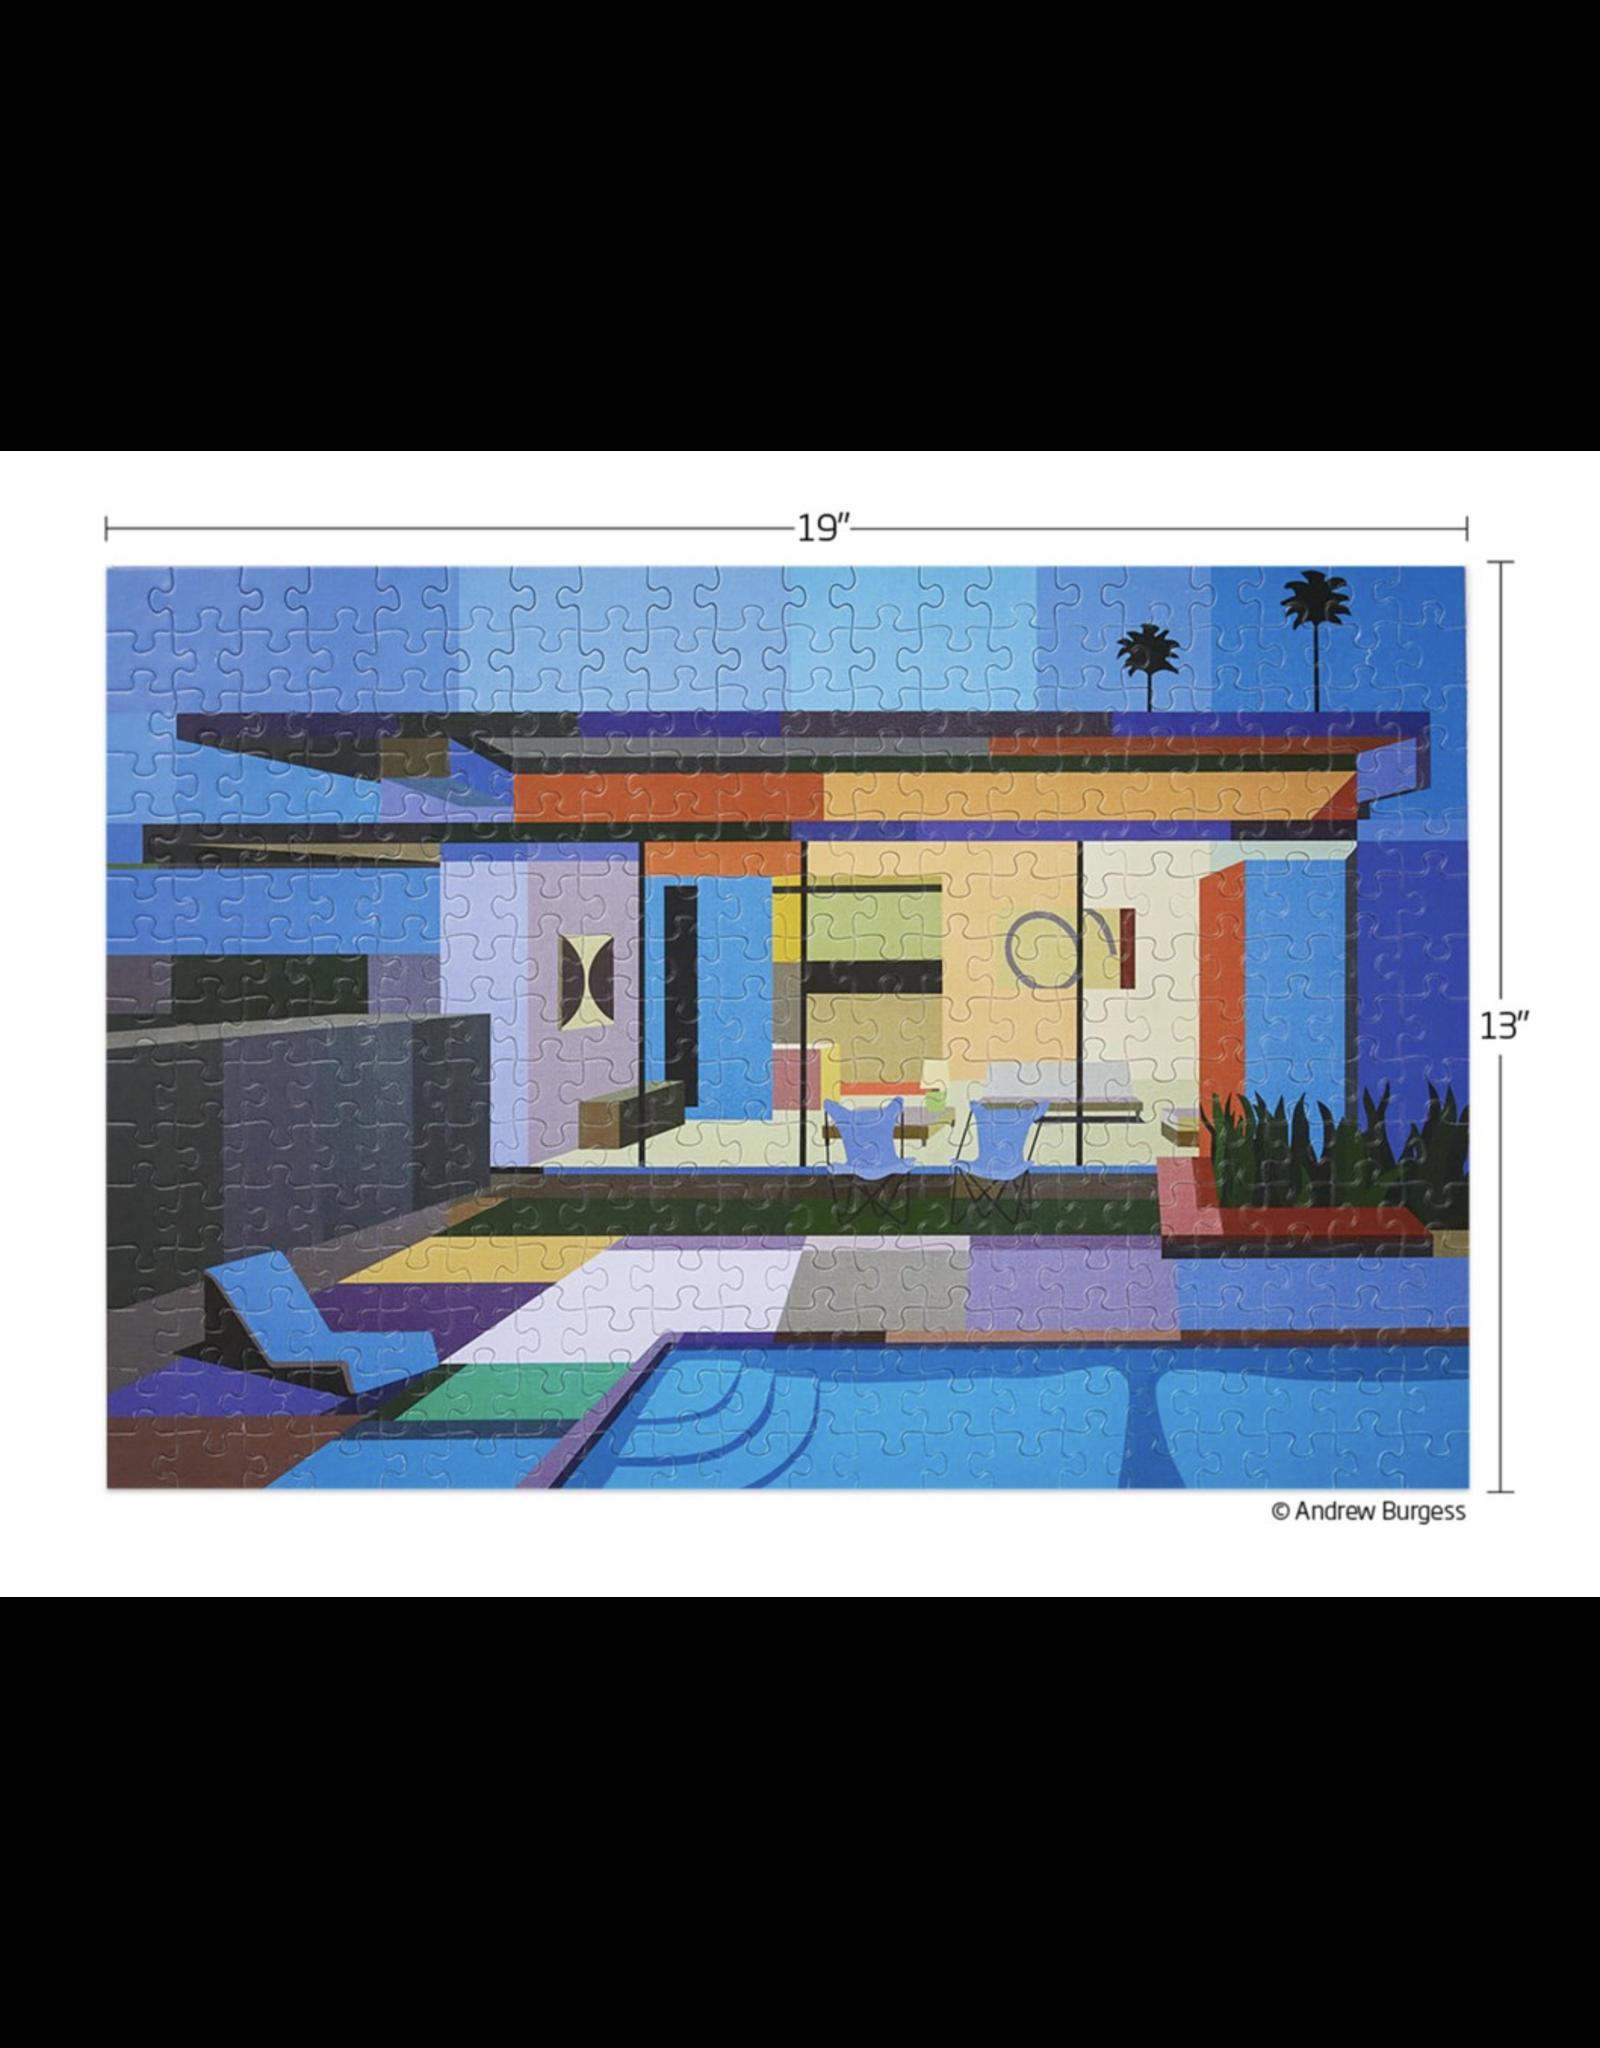 Werkshoppe Palm Springs Mid-Century Architecture - 300 Piece Puzzle